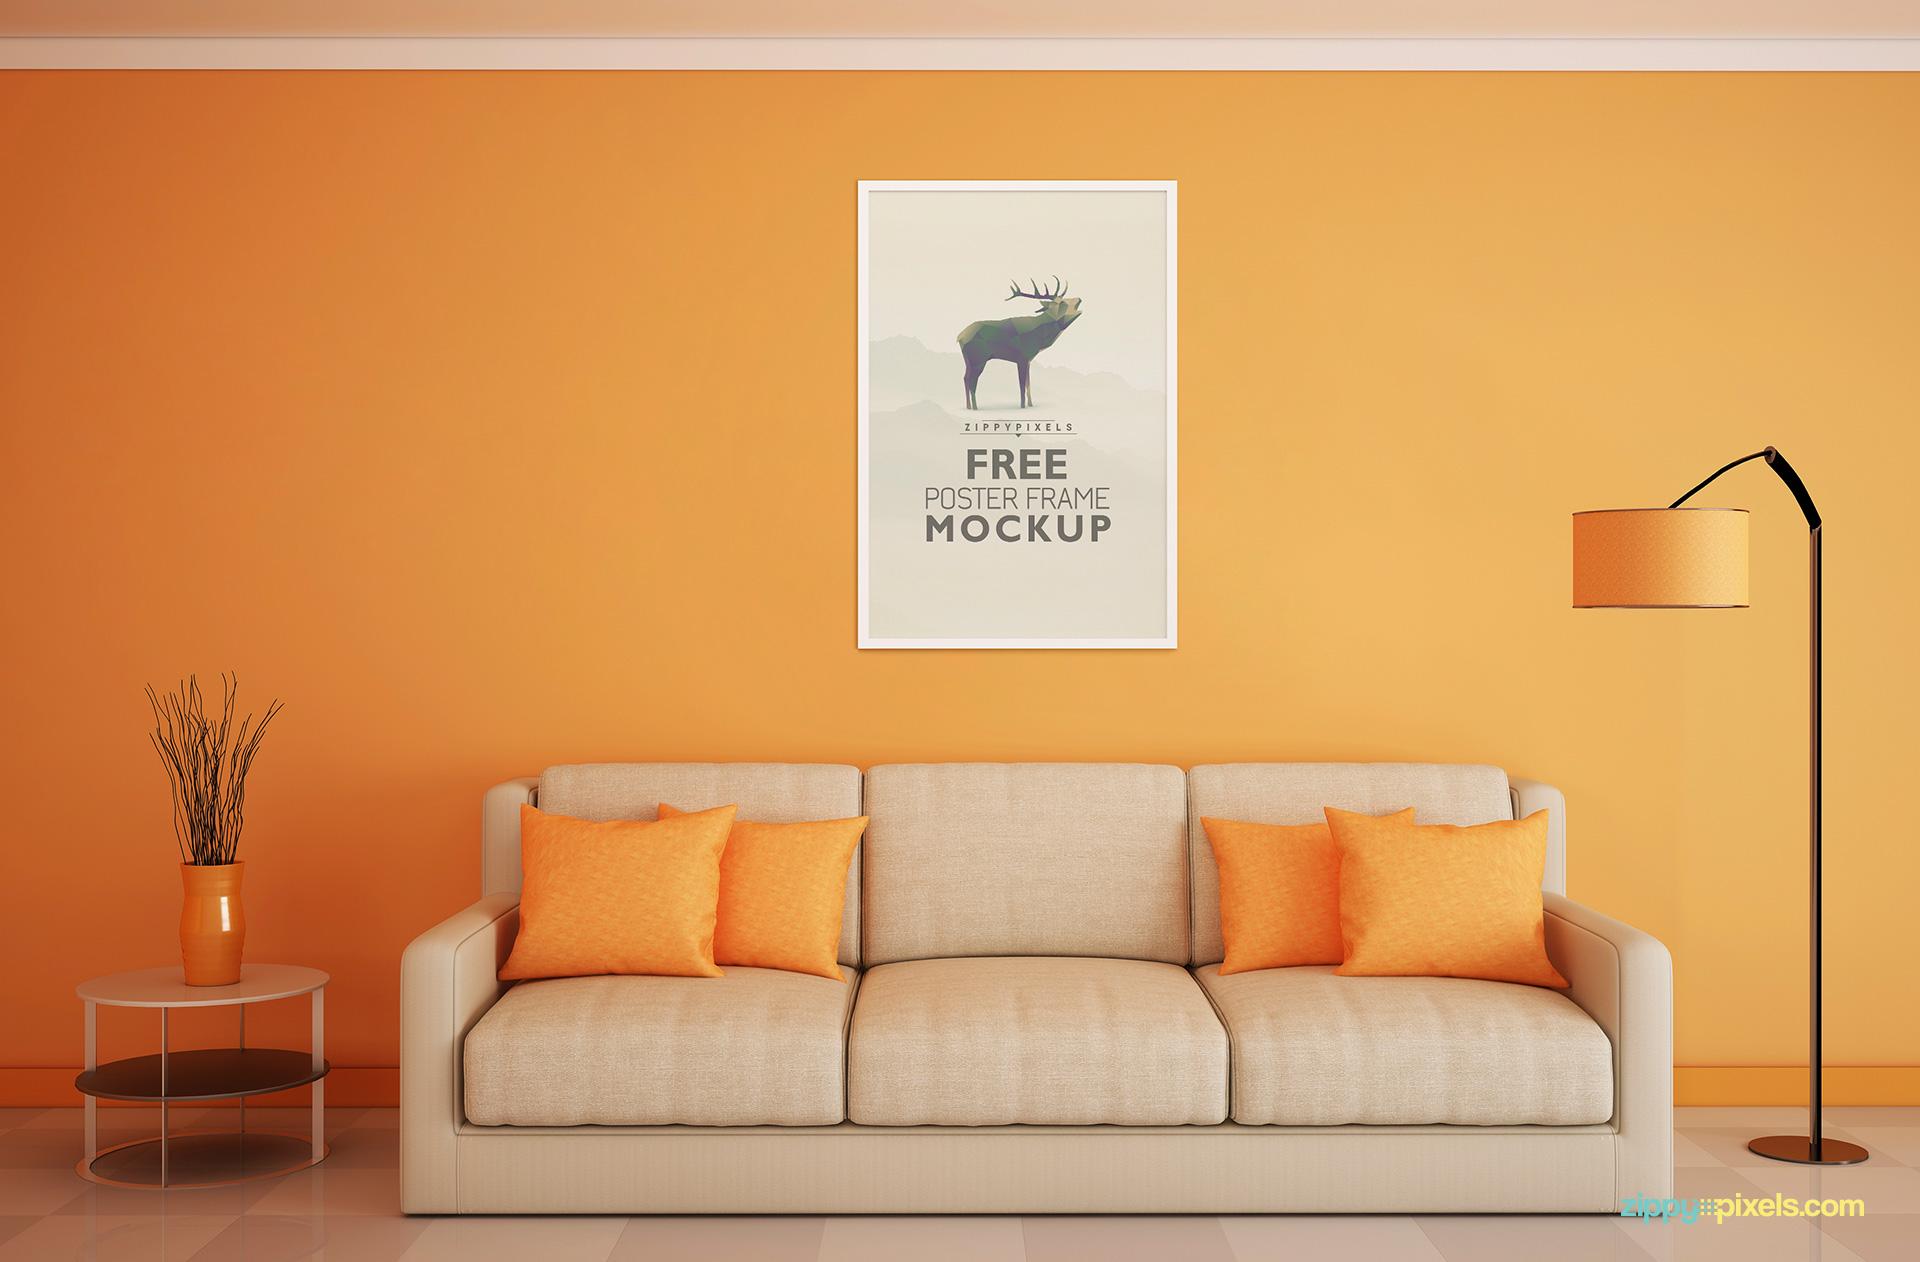 free-poster-frame-verticle-3-4-mockup